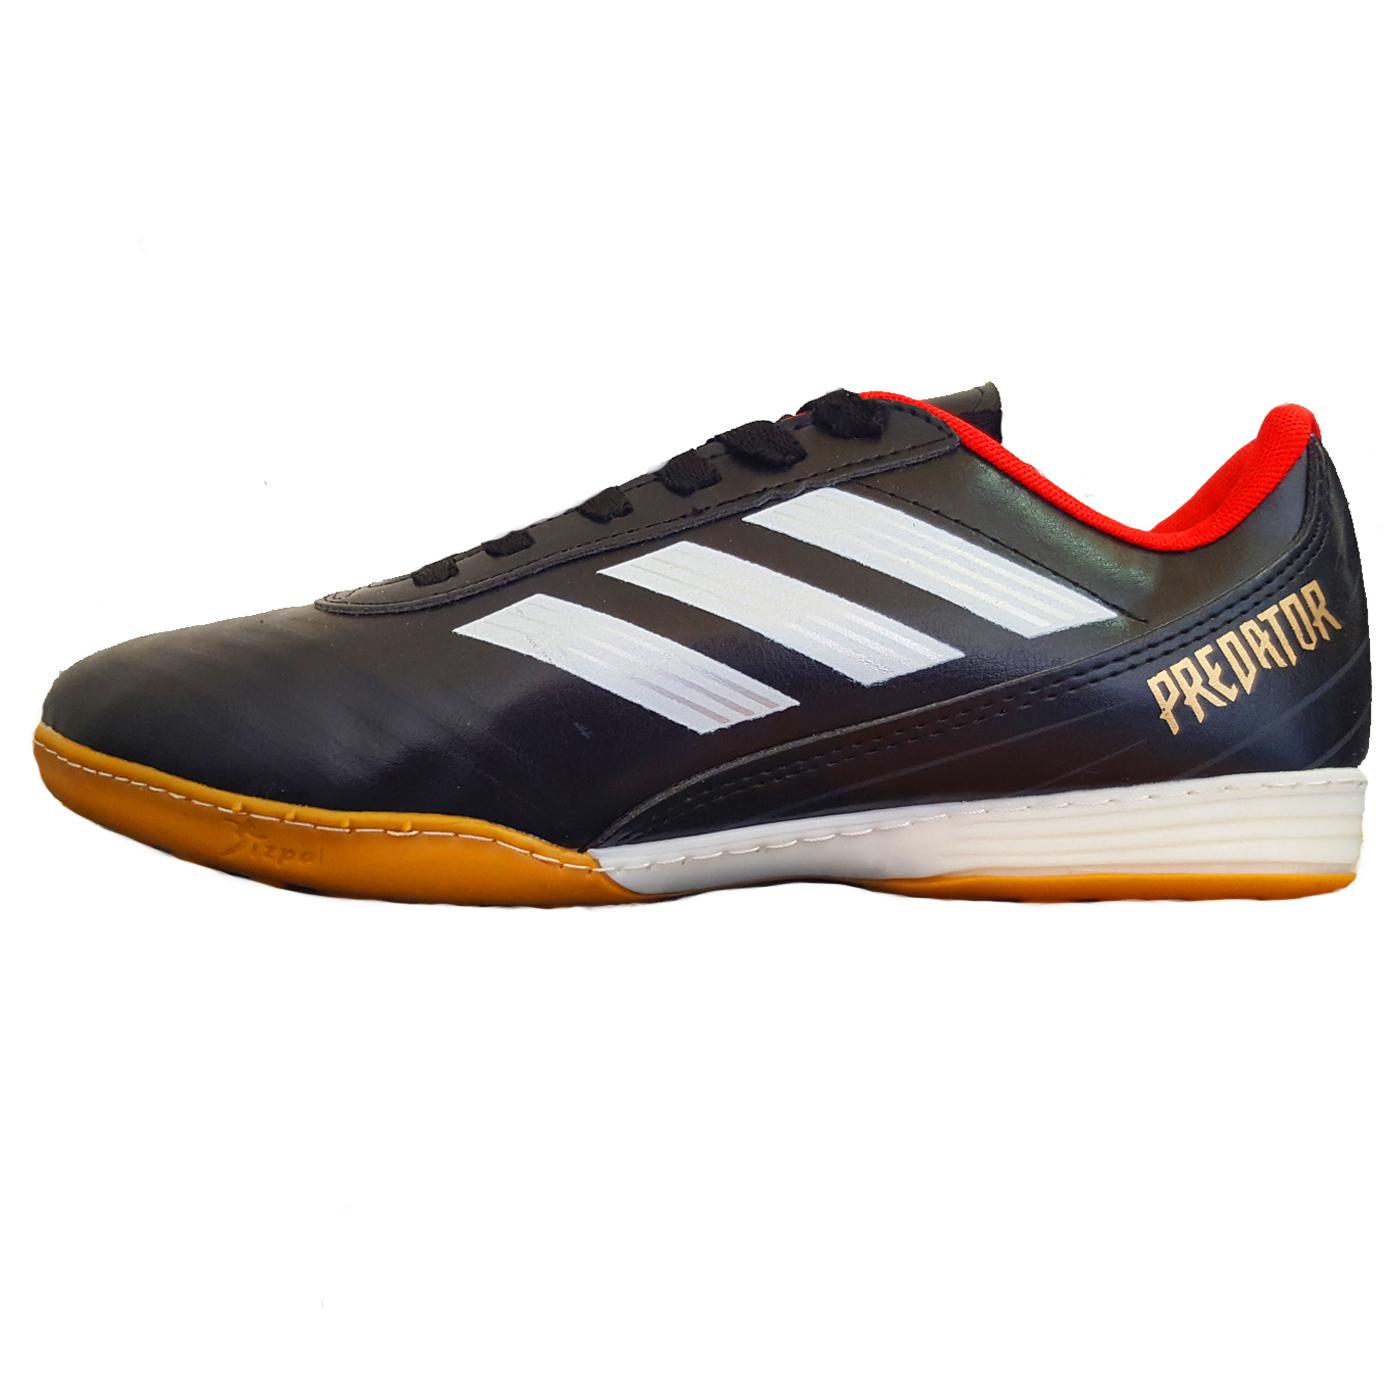 قیمت کفش فوتسال مردانه مدل پریدیتور کد PRE-06